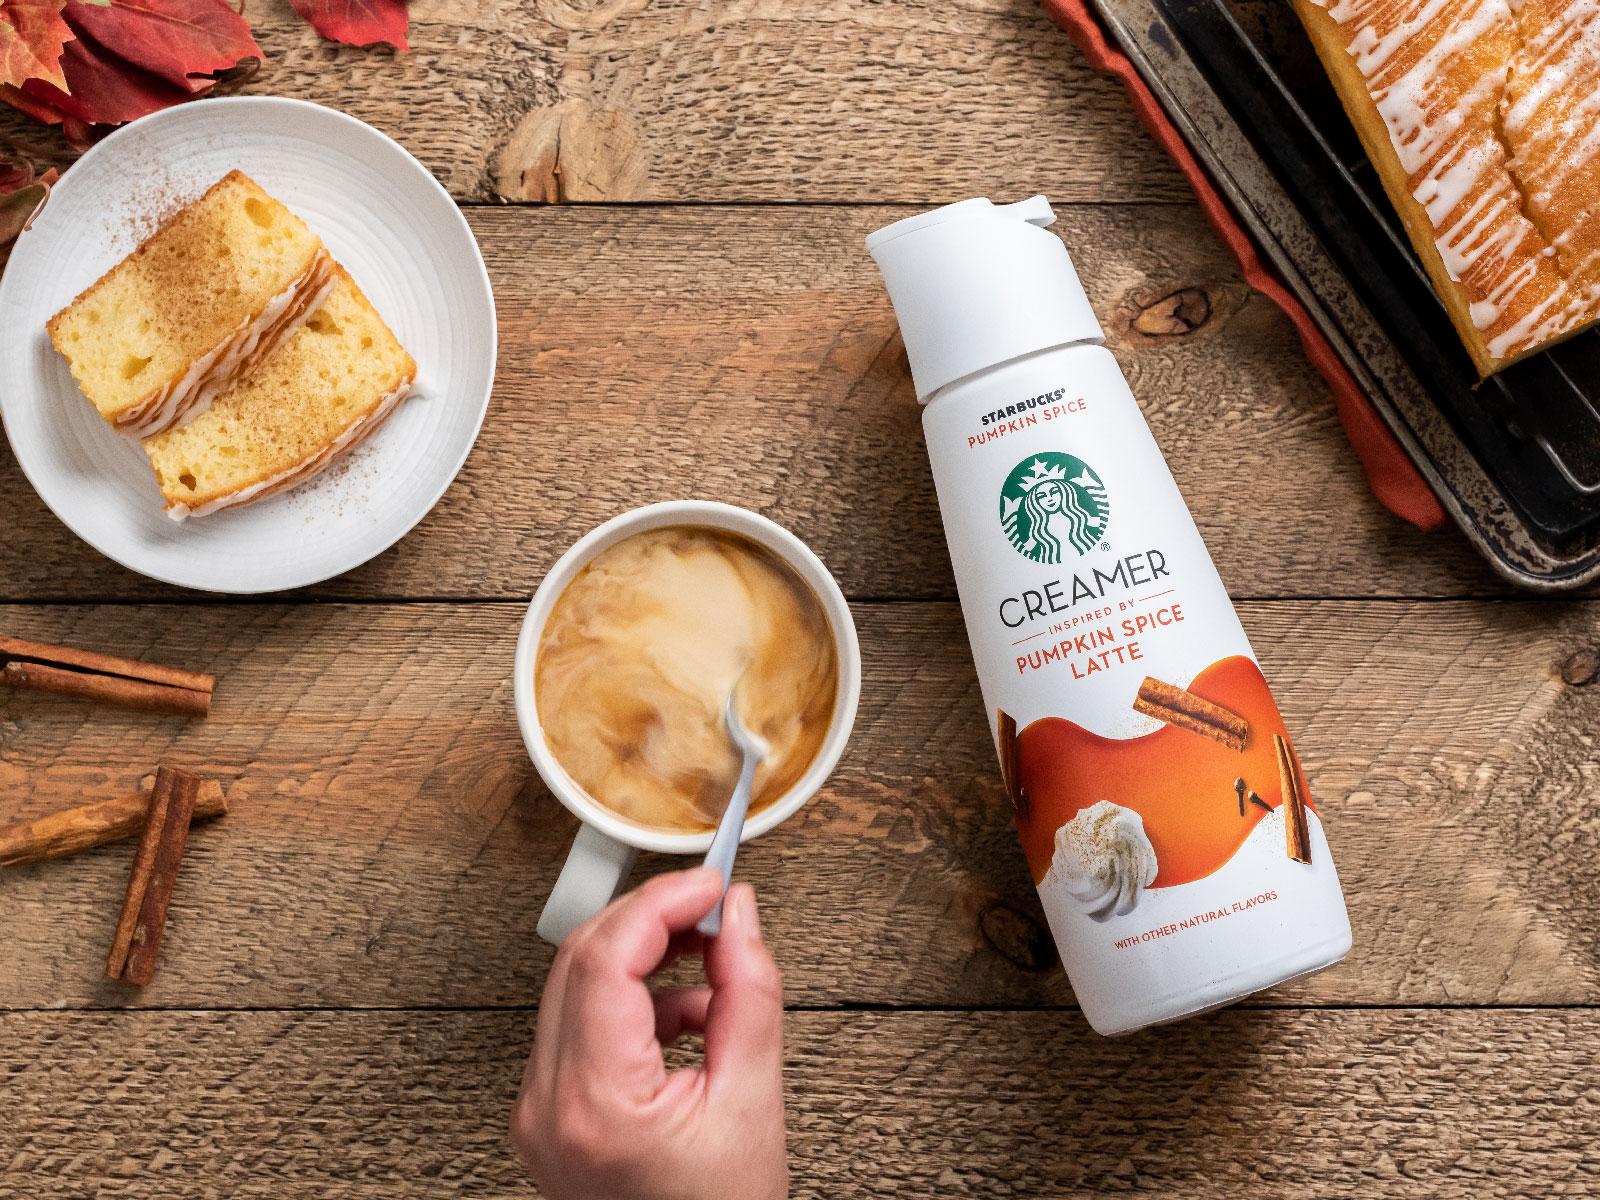 Starbucks Kicks Off PSL Season Early with New Pumpkin Spice Creamer